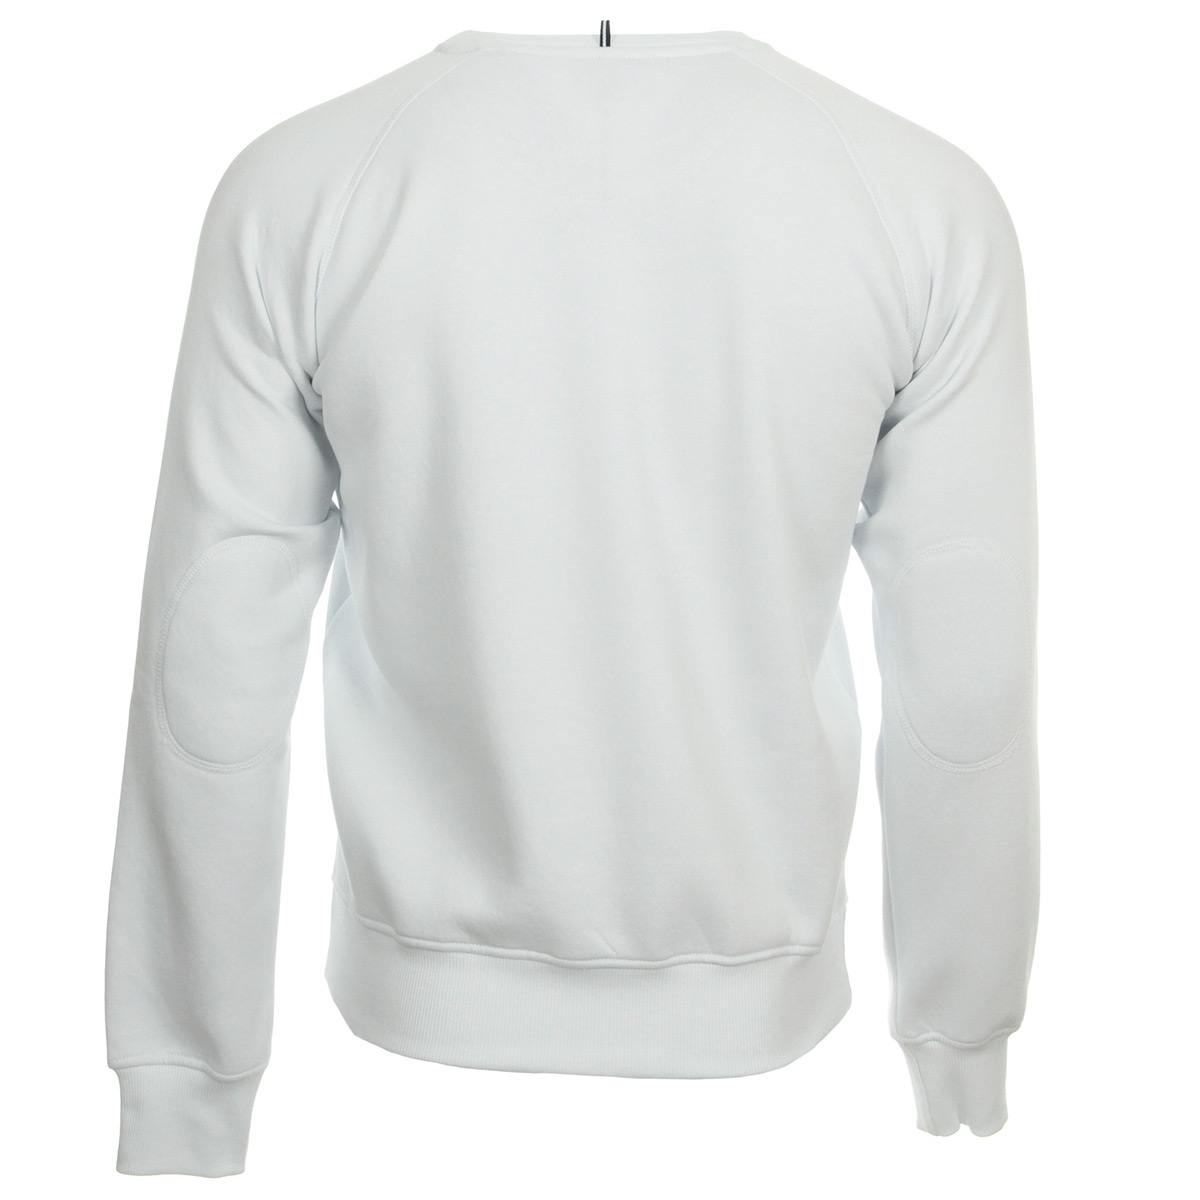 Ellesse Eh H Sws Col Rond Uni Blanc 1032NBLANC, Sweats